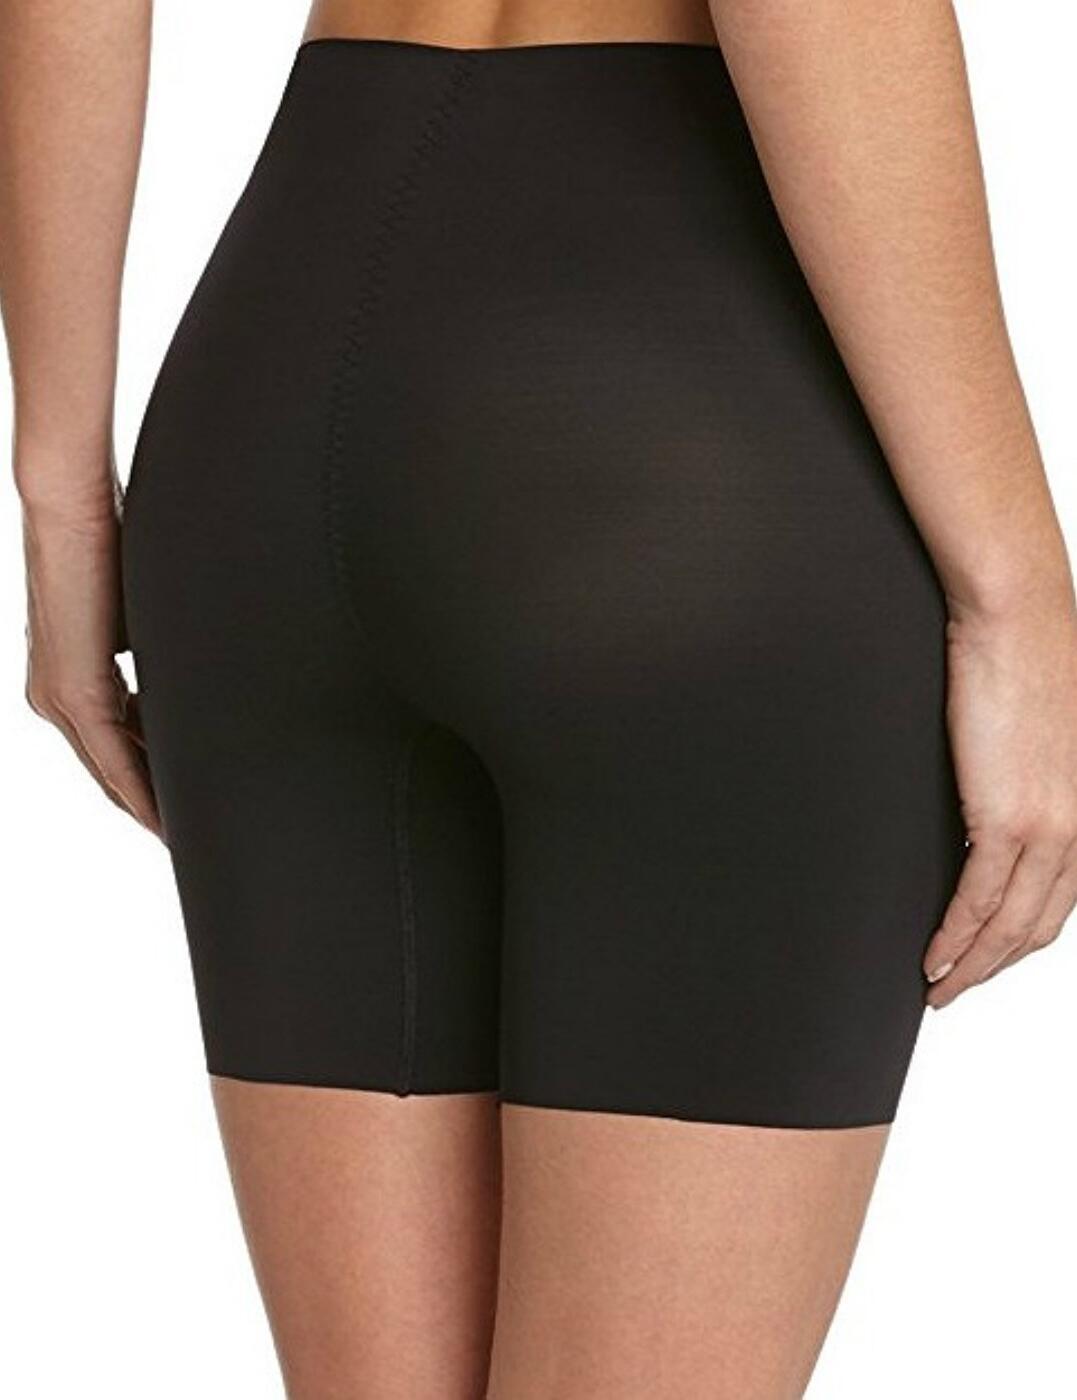 Wacoal-Beauty-Secret-Lift-Up-Shaping-Slimming-Panty-GRA541-Wacoal-Shapewear Indexbild 5